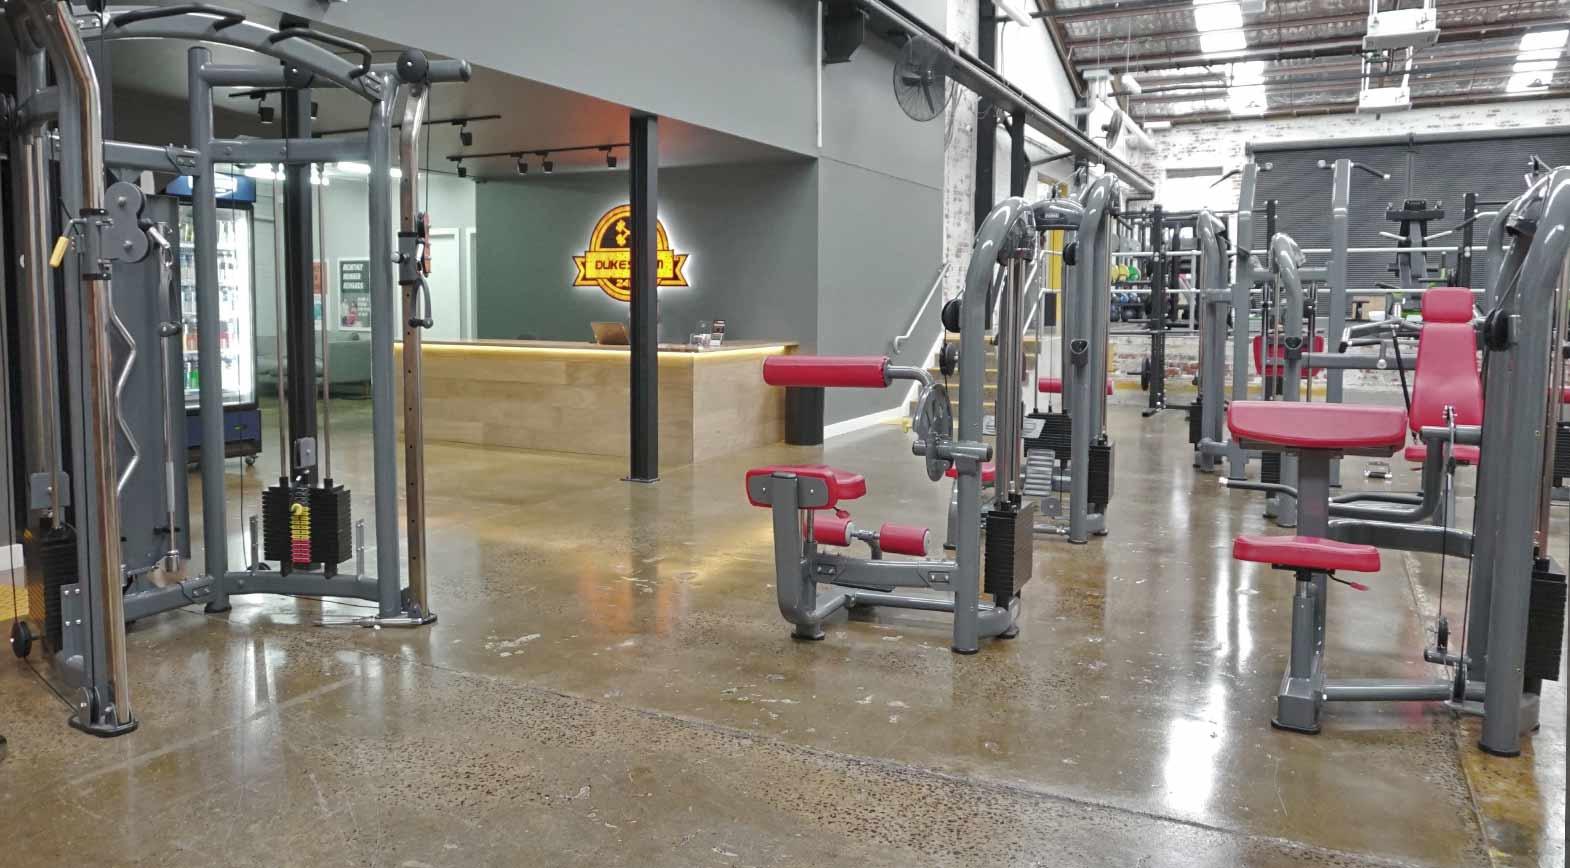 dukes gym richmond machine weights pin loaded machines